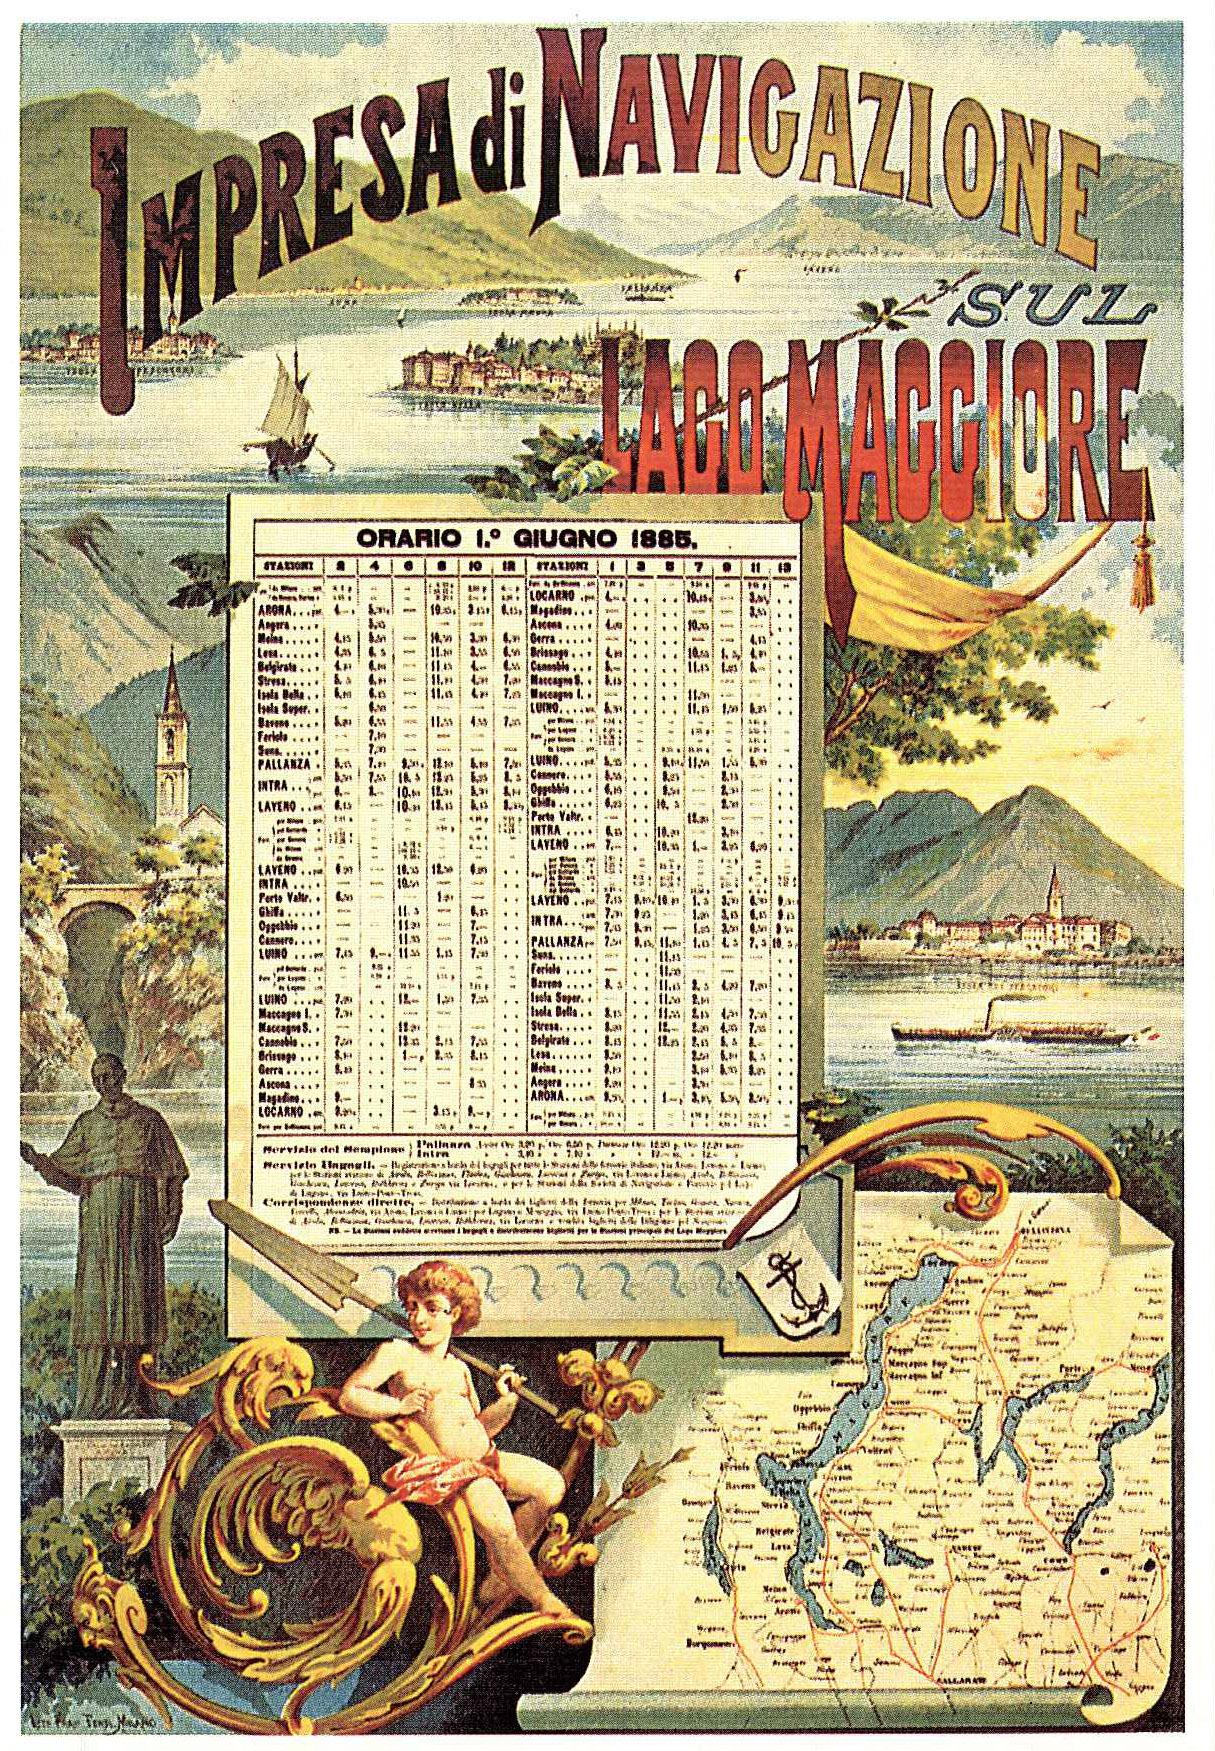 Times Table Chart 1 20: Impresa di Navigatione Lago Magiore 1885.jpg - Wikimedia Commons,Chart